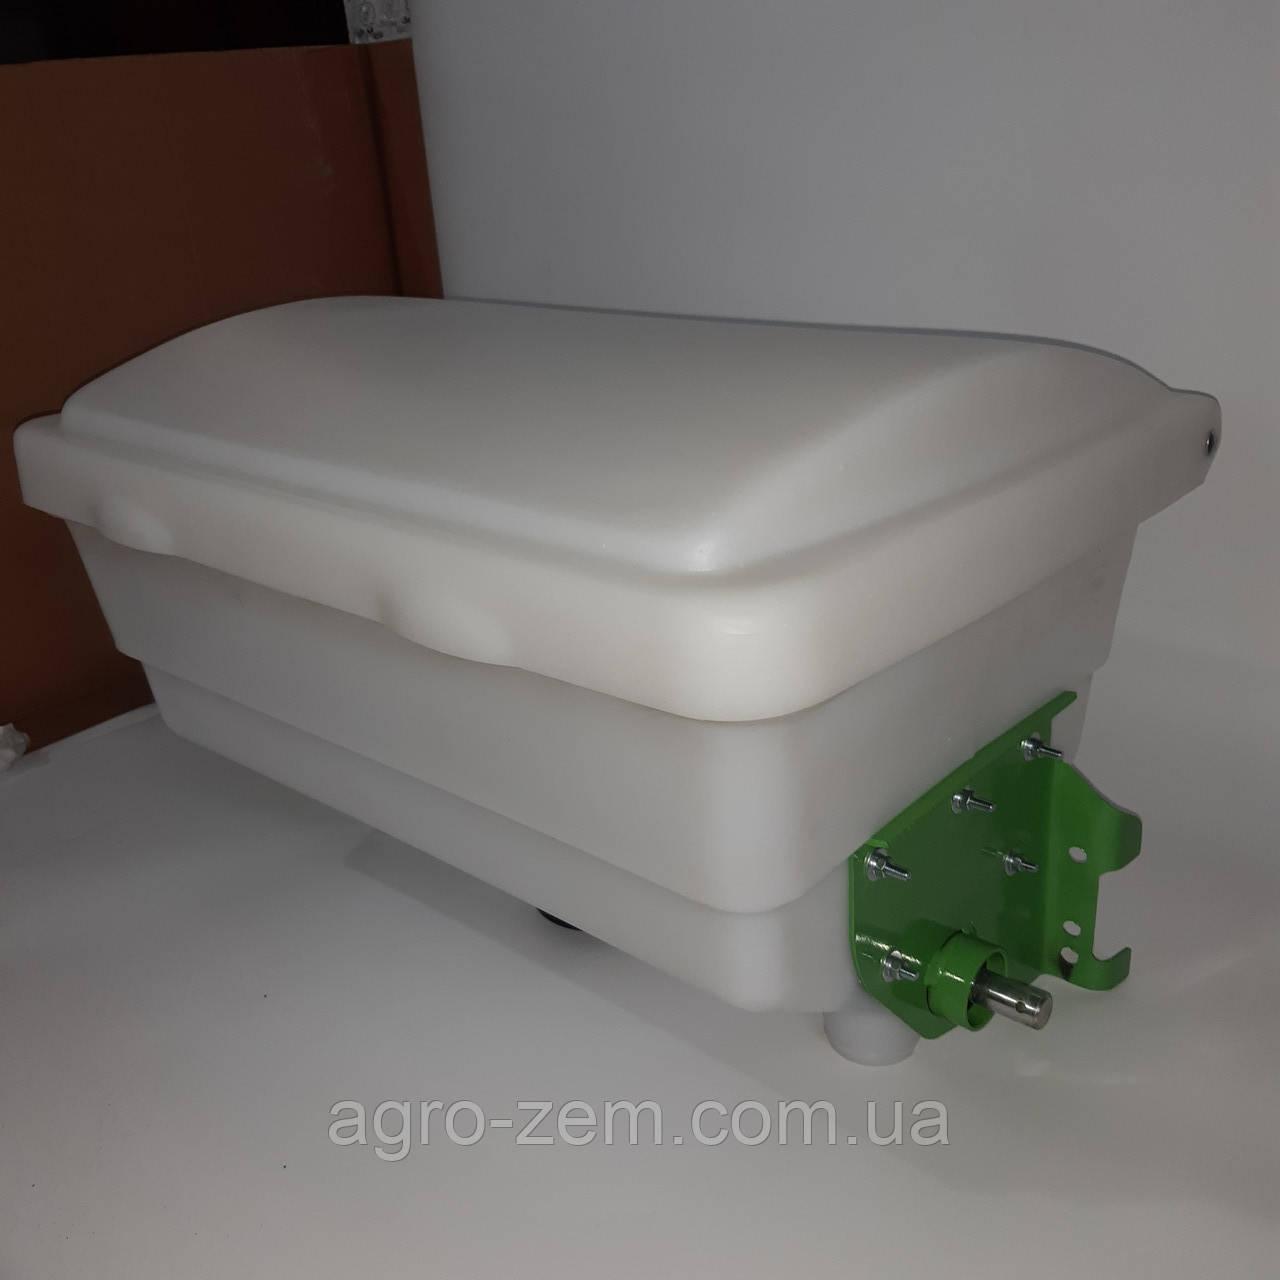 Аппарат туковысевающий КРН (банка туковая) (пластик) Н 509.046.2240